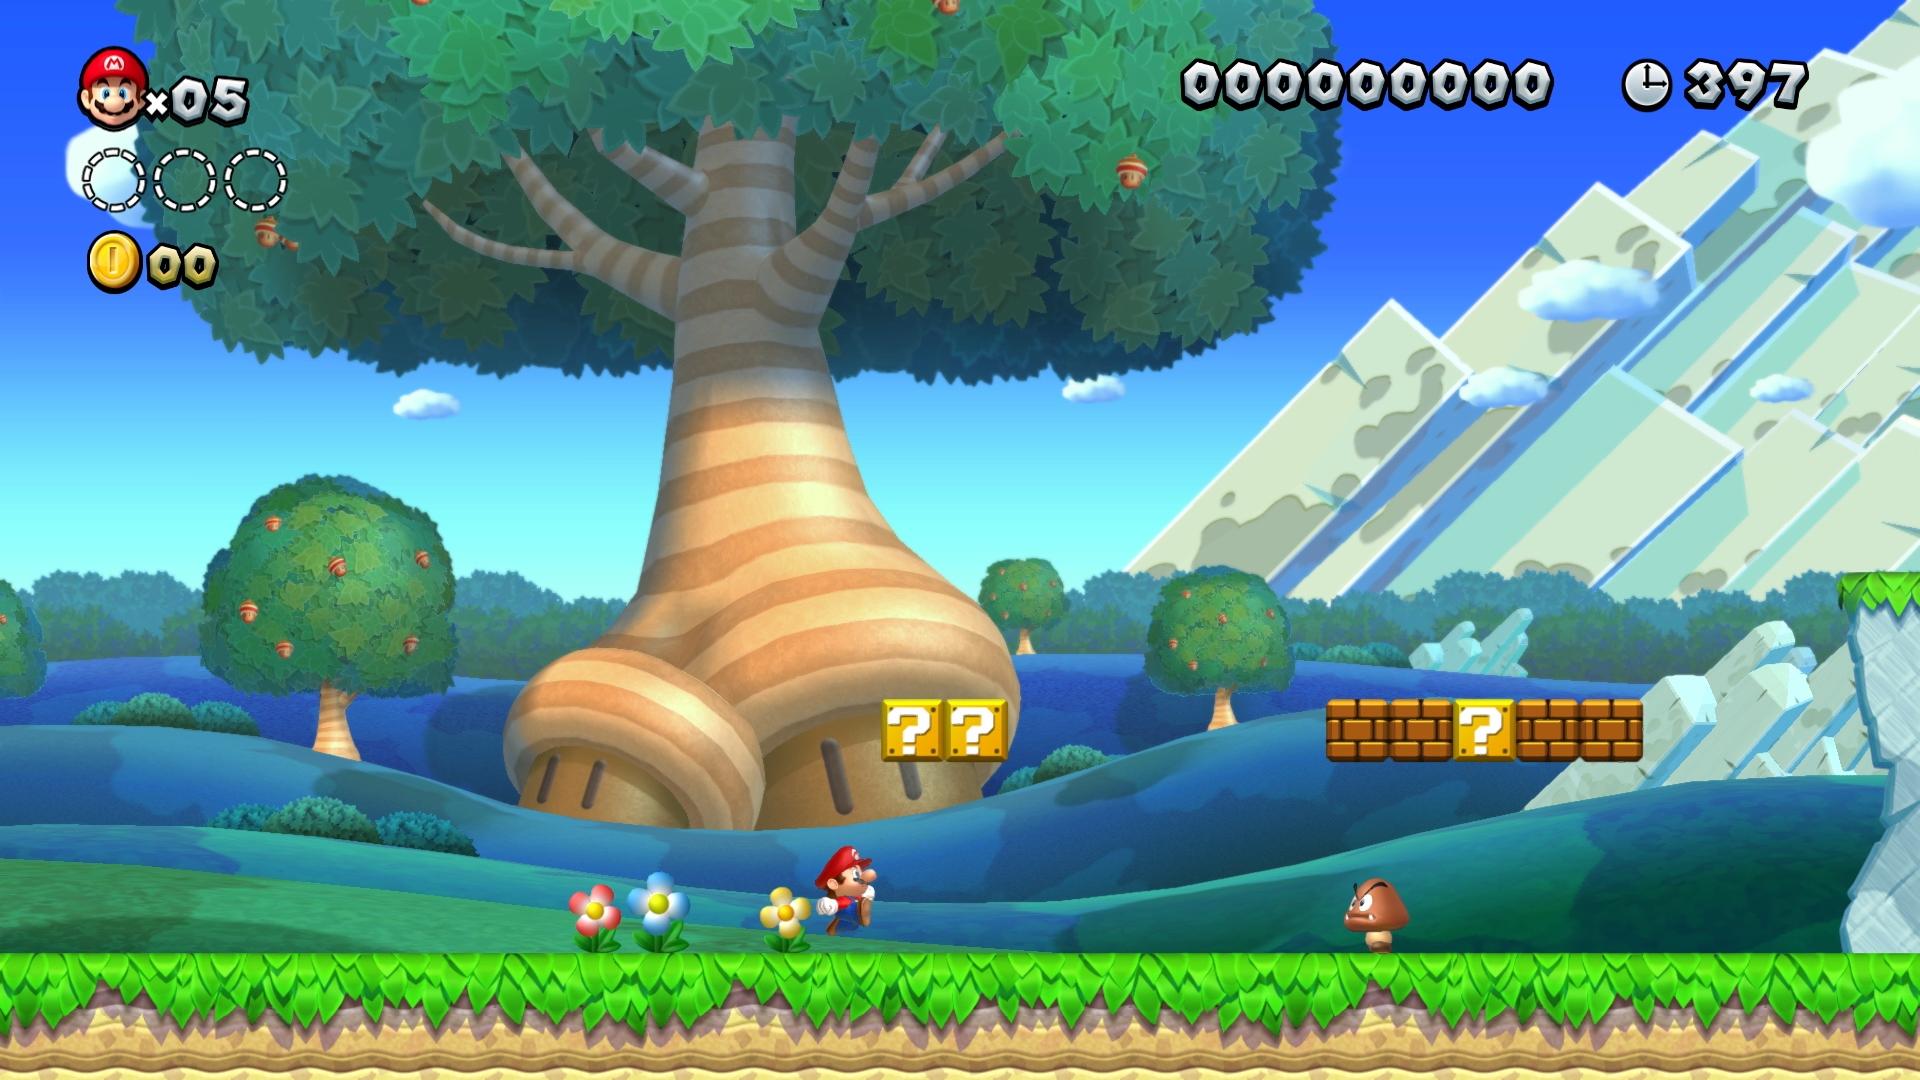 New Super Mario Bros. U Deluxe (NS) - all very familiar